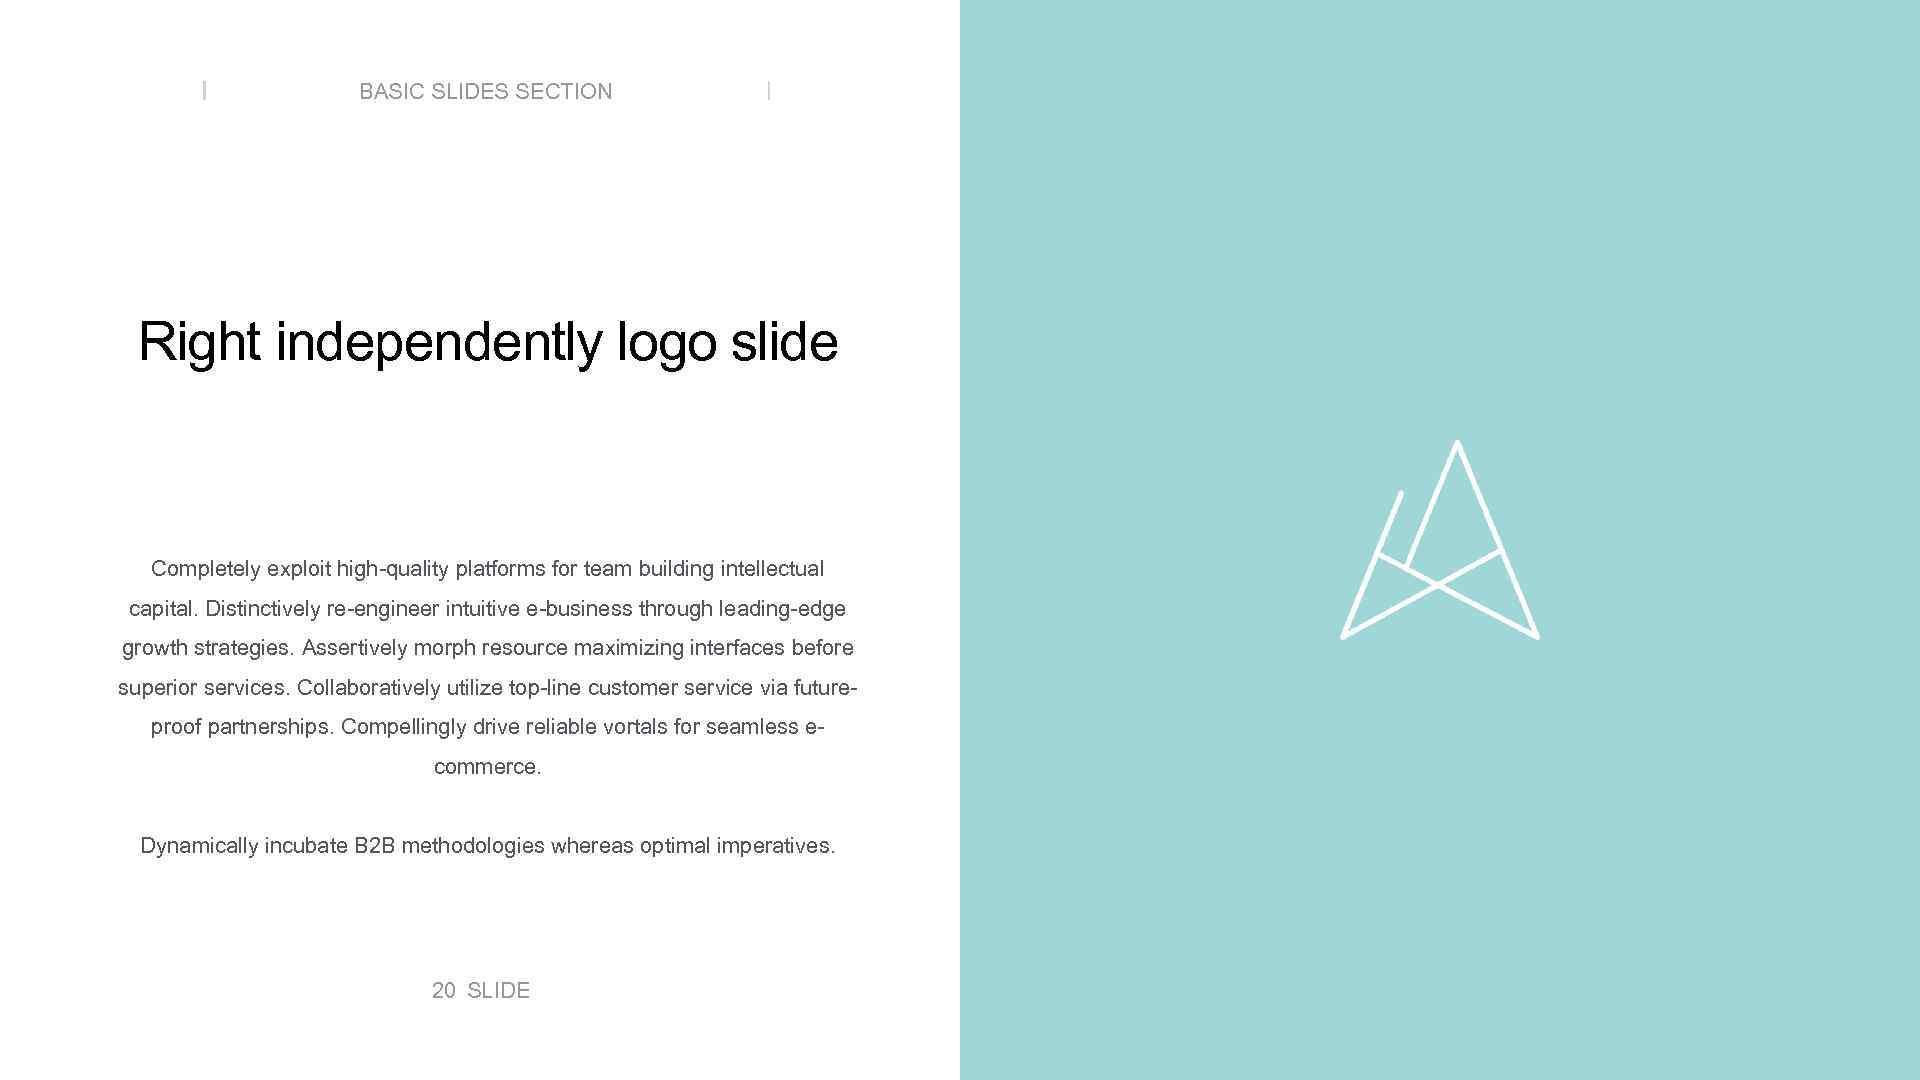 BASIC SLIDES SECTION Right independently logo slide Completely exploit high-quality platforms for team building